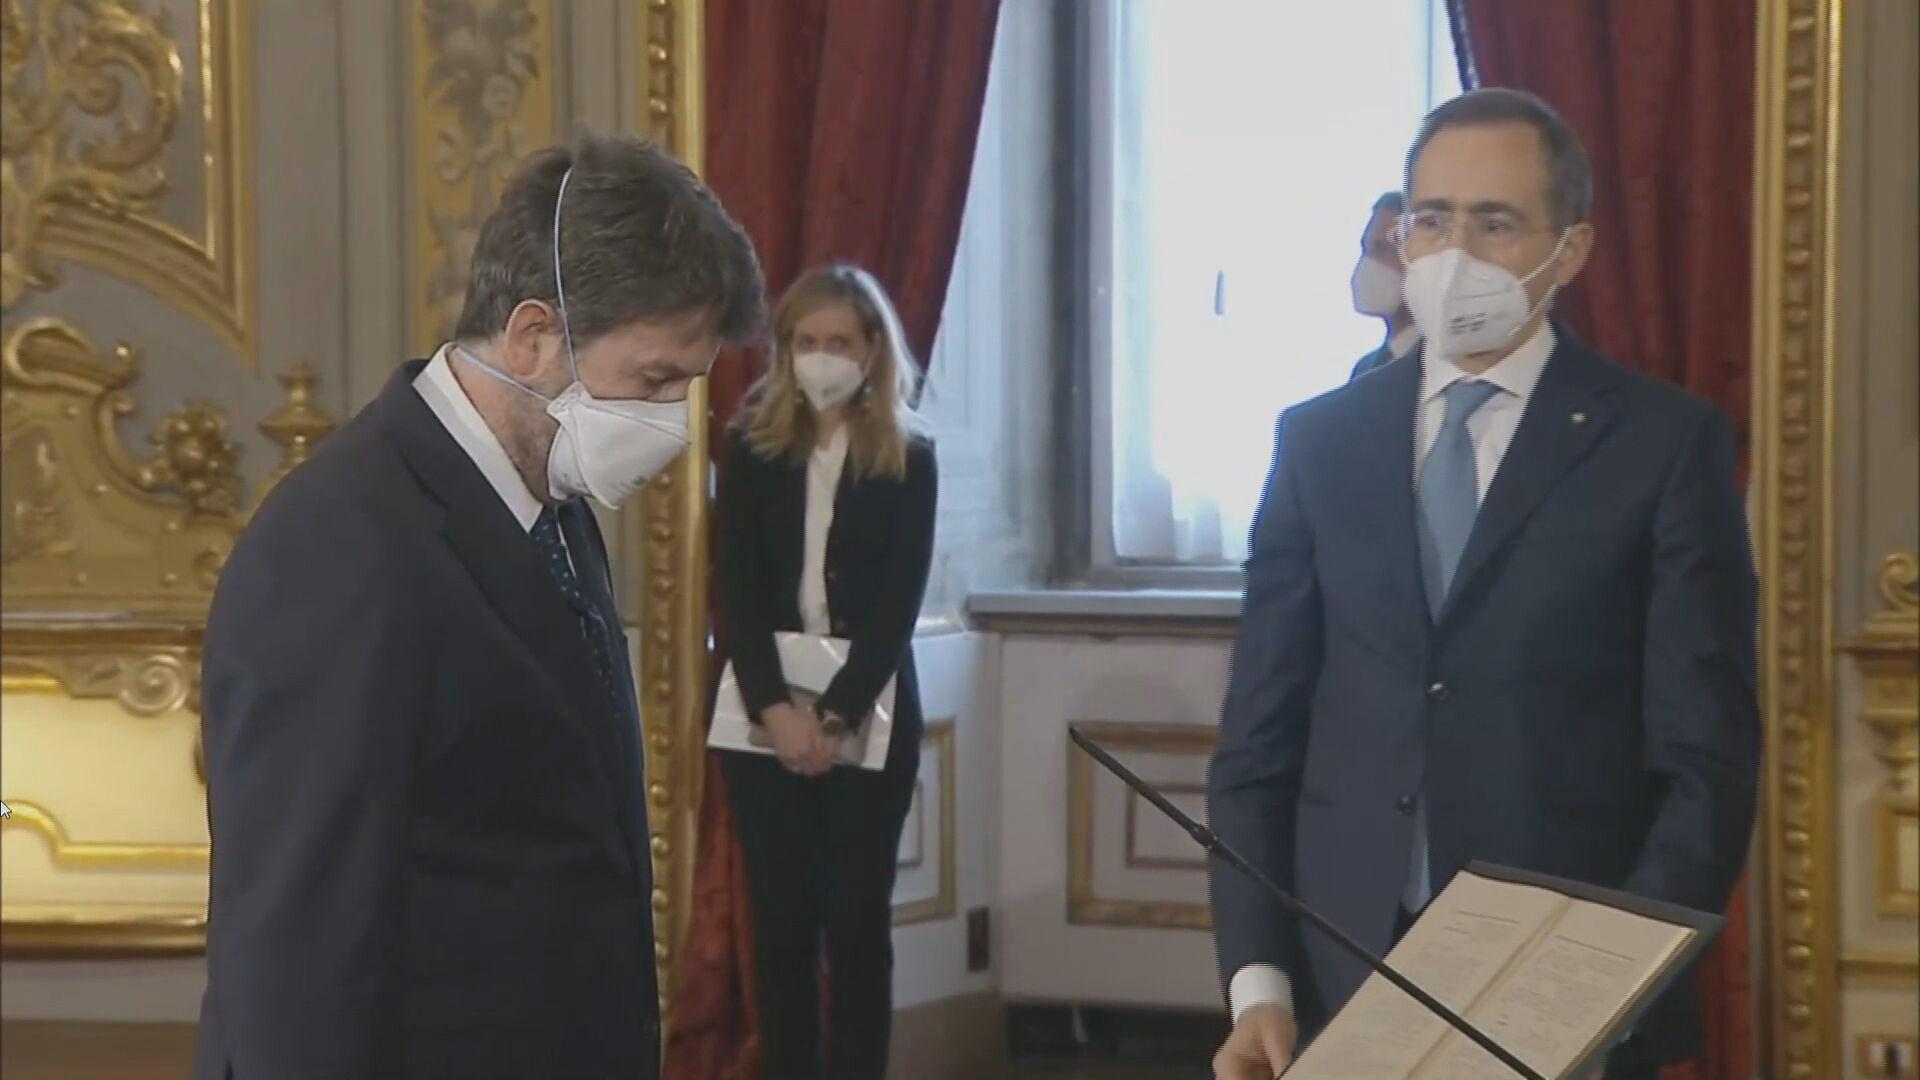 Mário Draghi toma posse como Premiê na Itália (13 fev 2021)